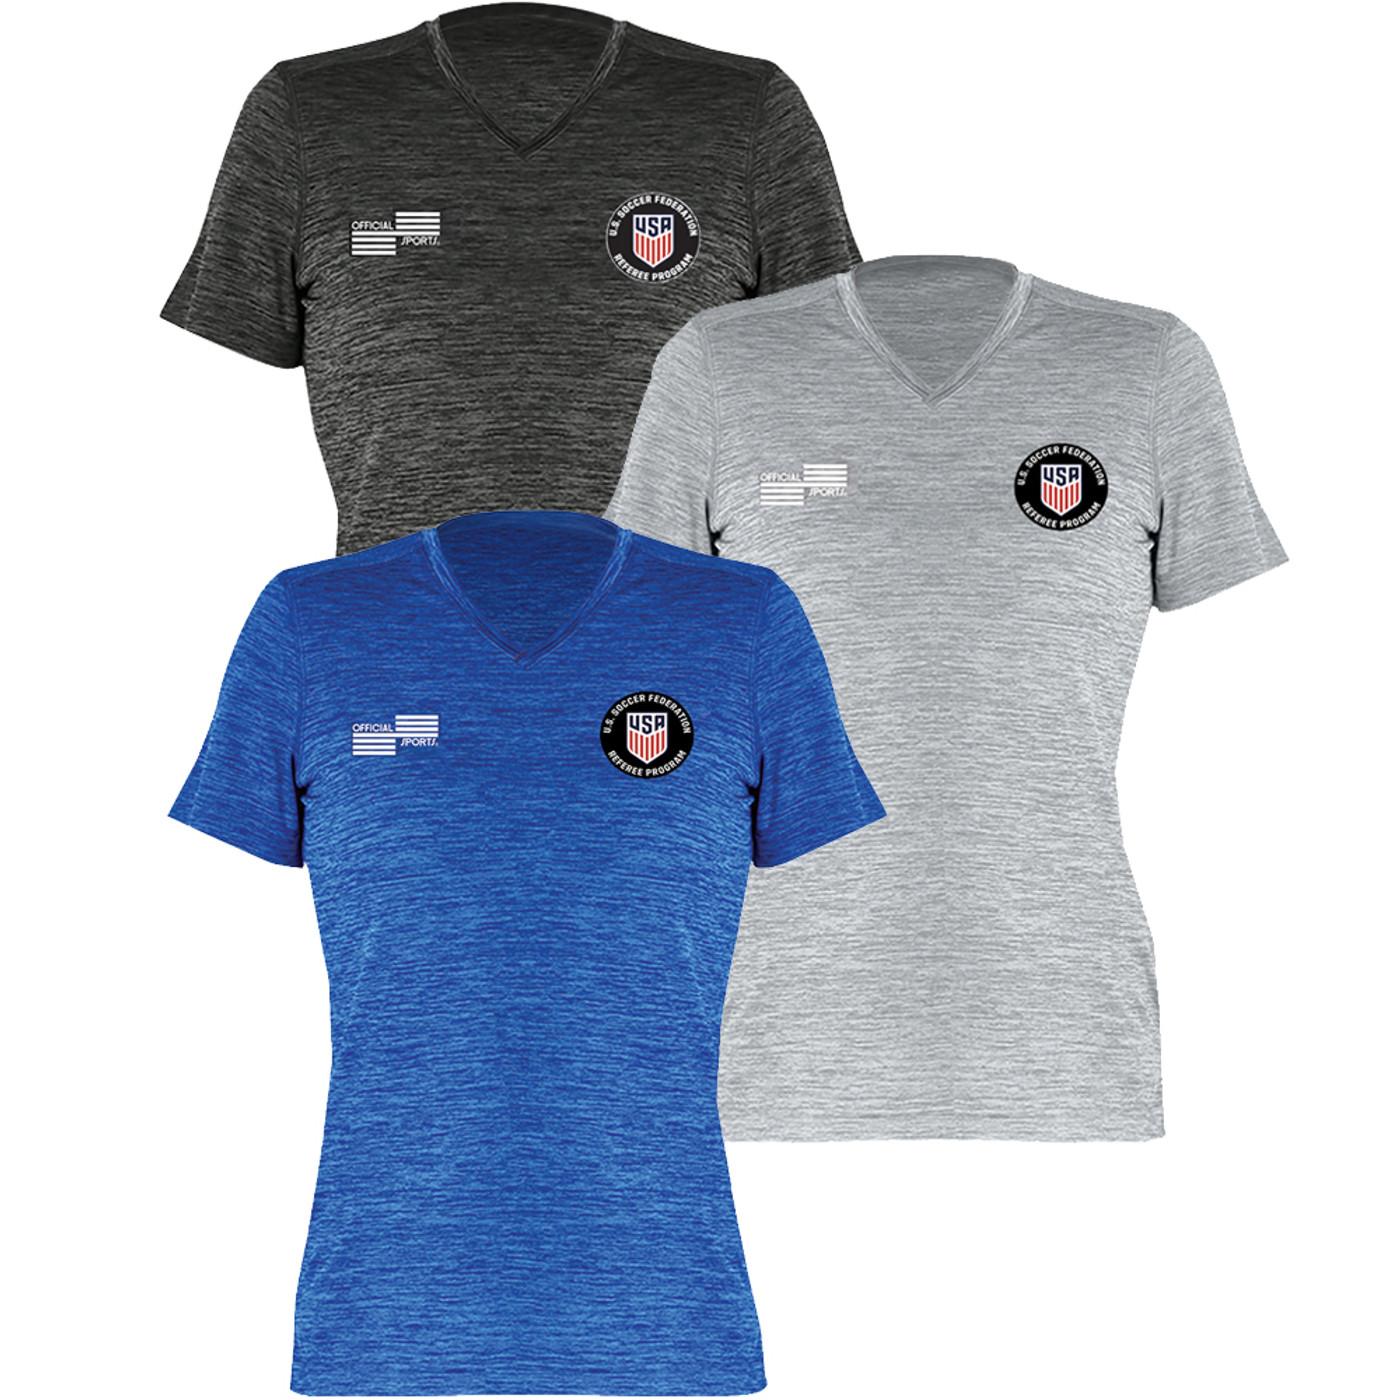 W2000CL USSF Women's Heathered Training T-Shirt